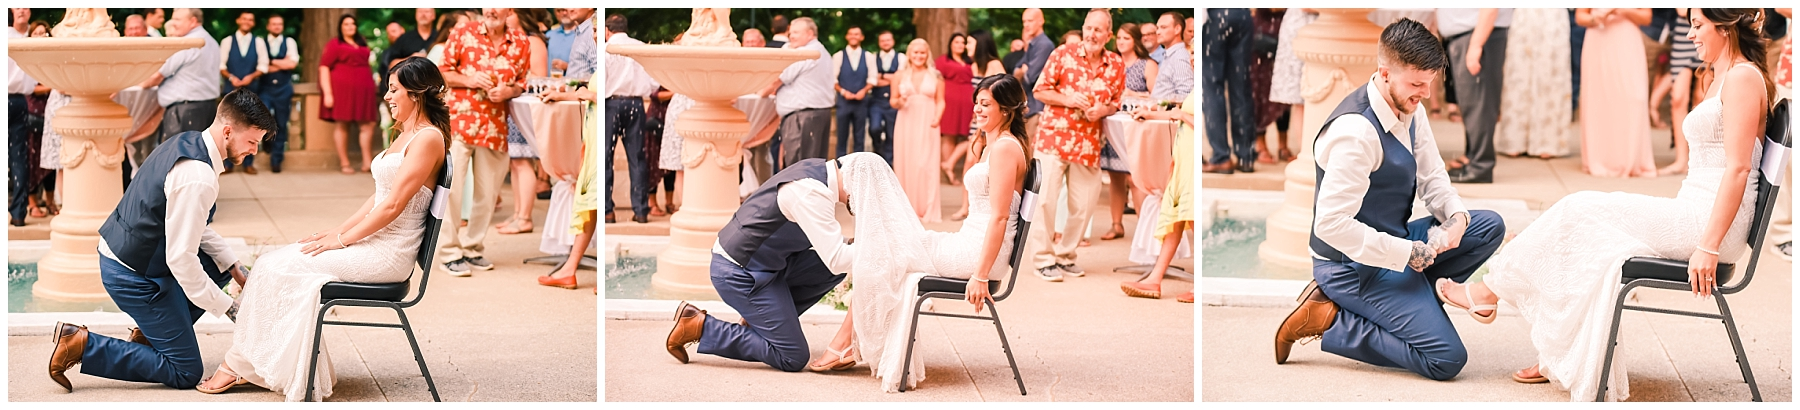 lafayette indiana wedding photography destination wedding fowler house mansion_0132.jpg